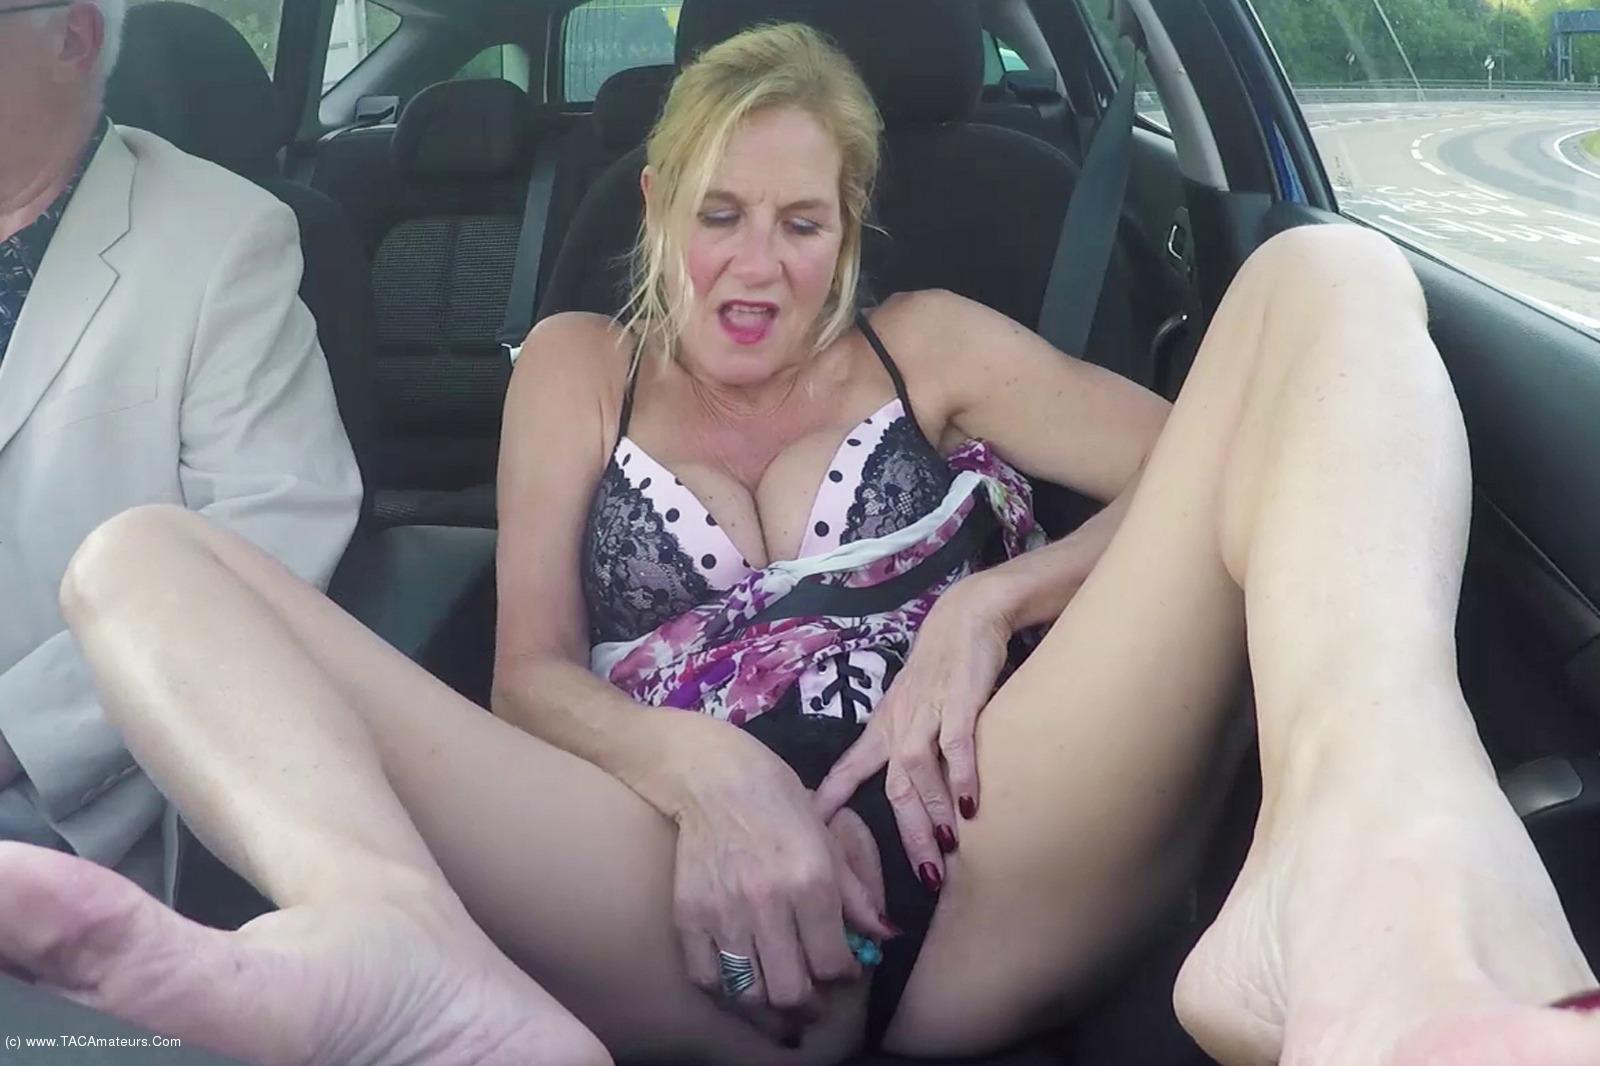 MollyMILF - Flashing In The Car scene 3